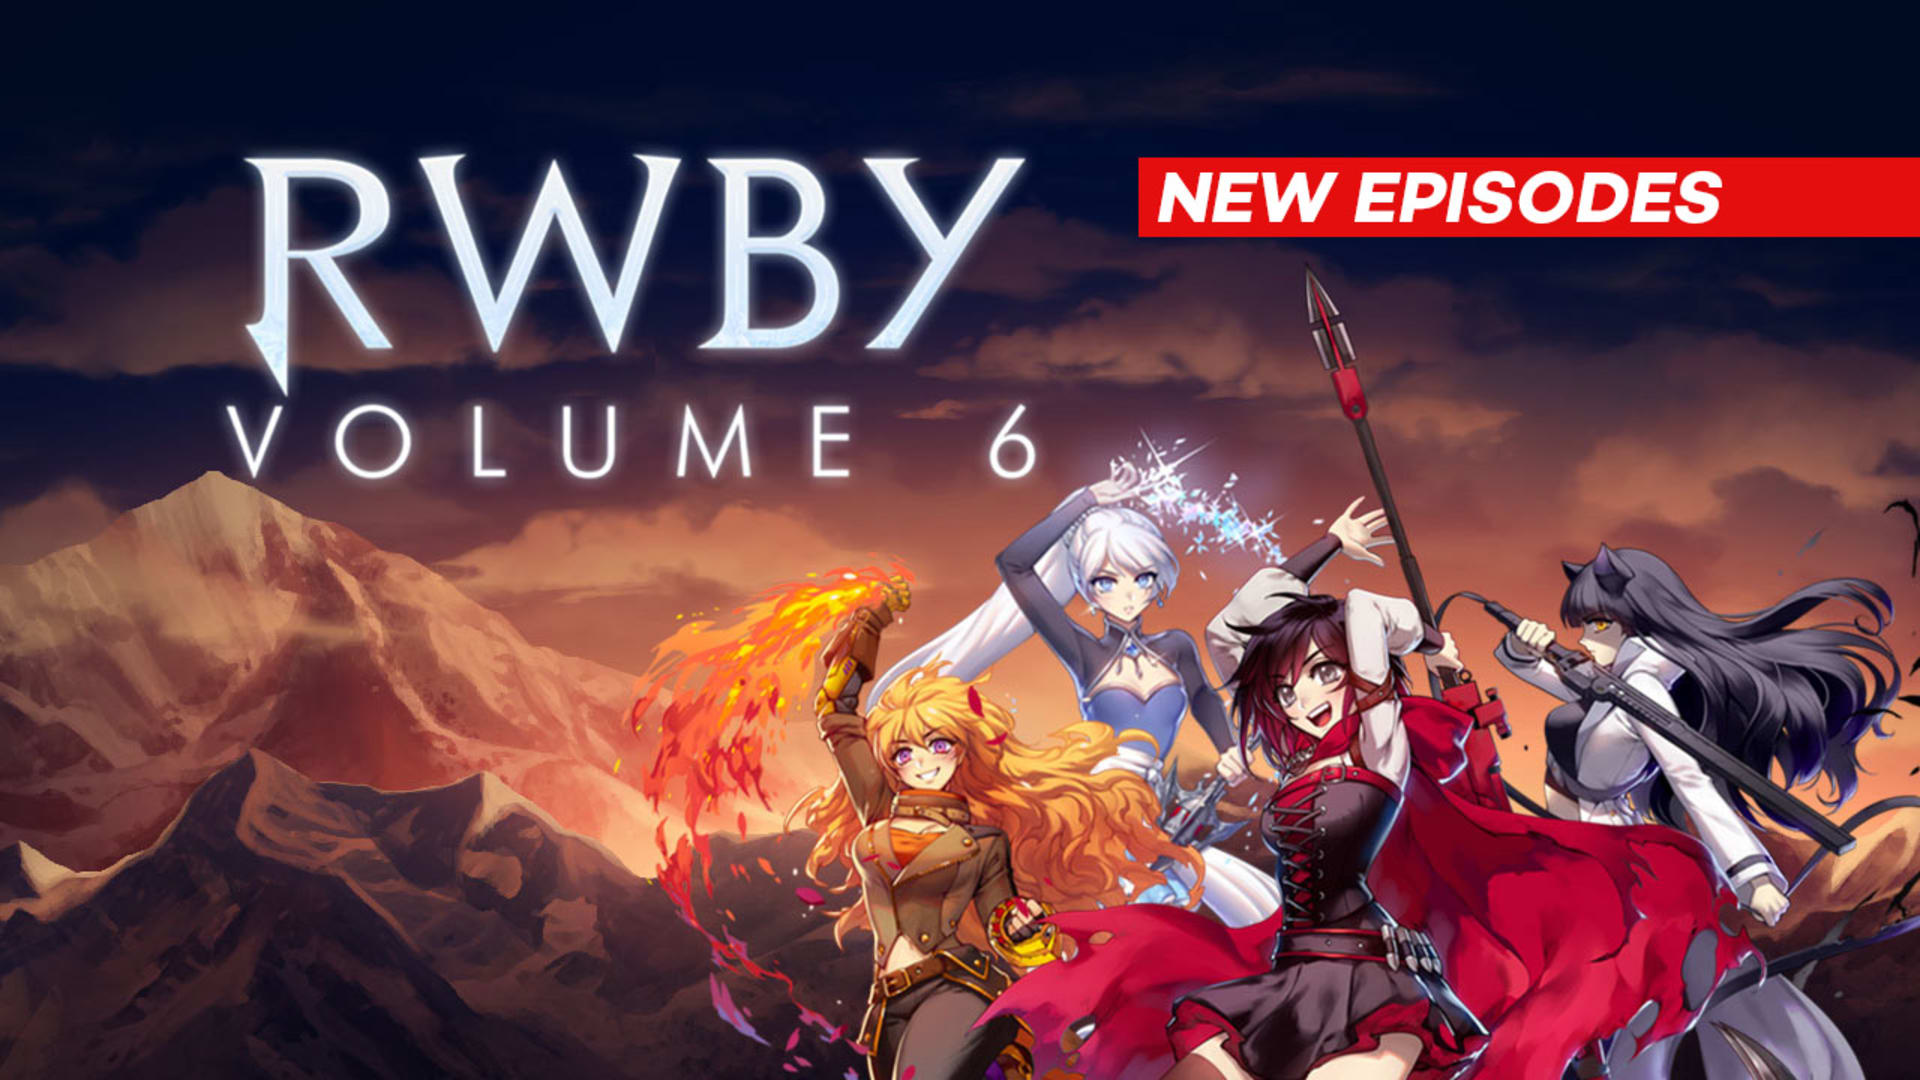 rwby episodes download torrent